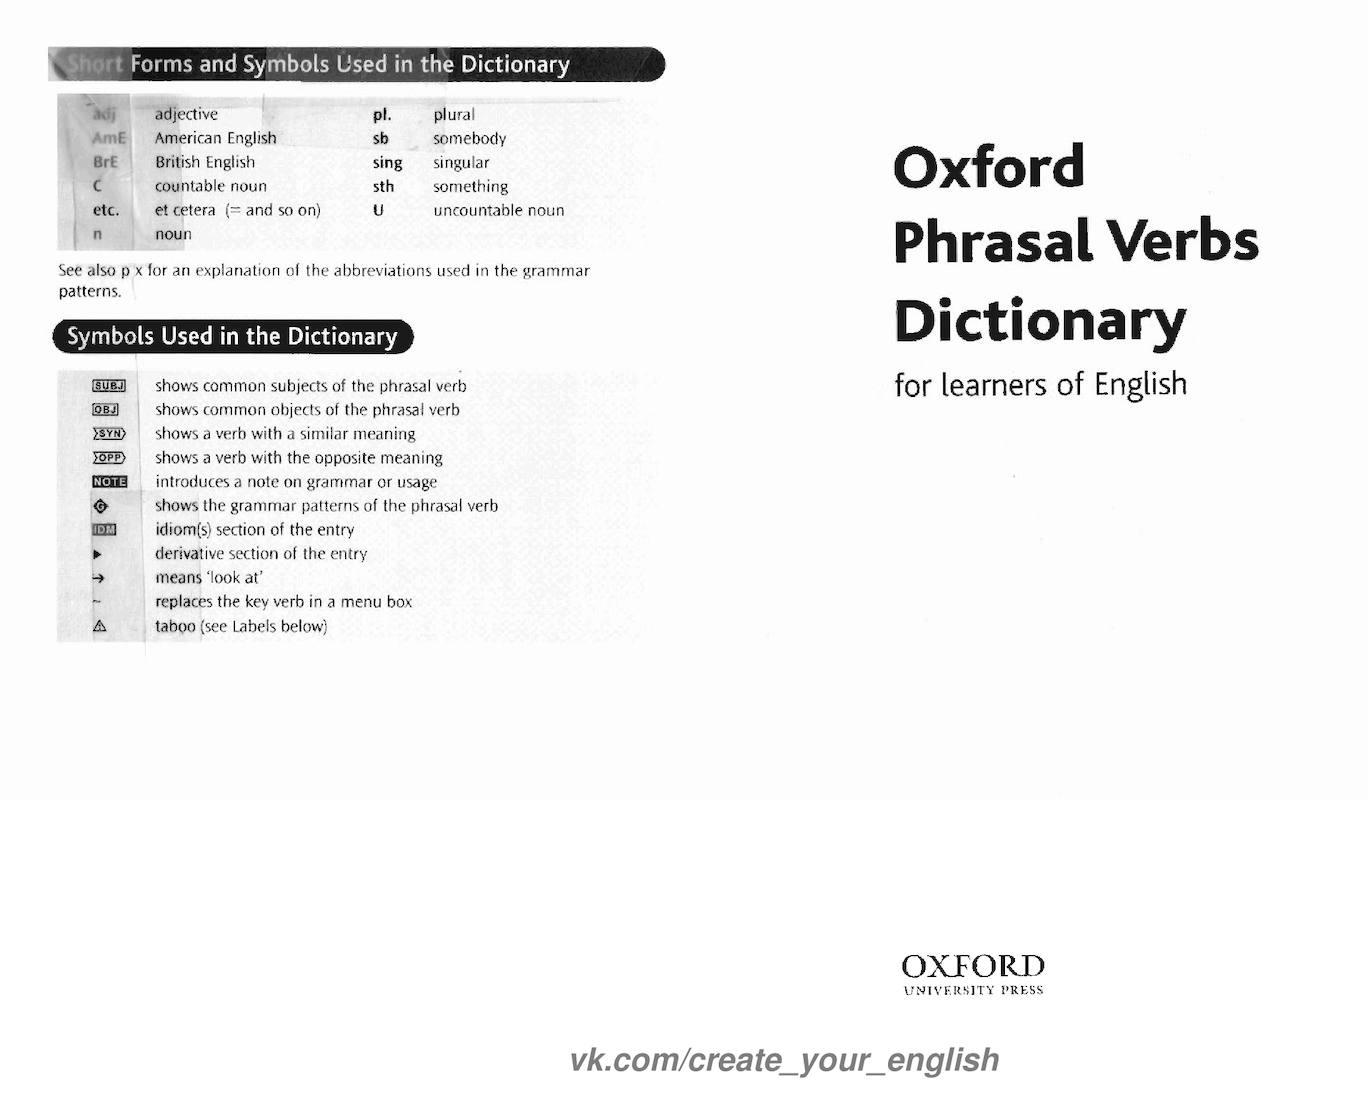 Calamo oxford phrasal verbs dictionary biocorpaavc